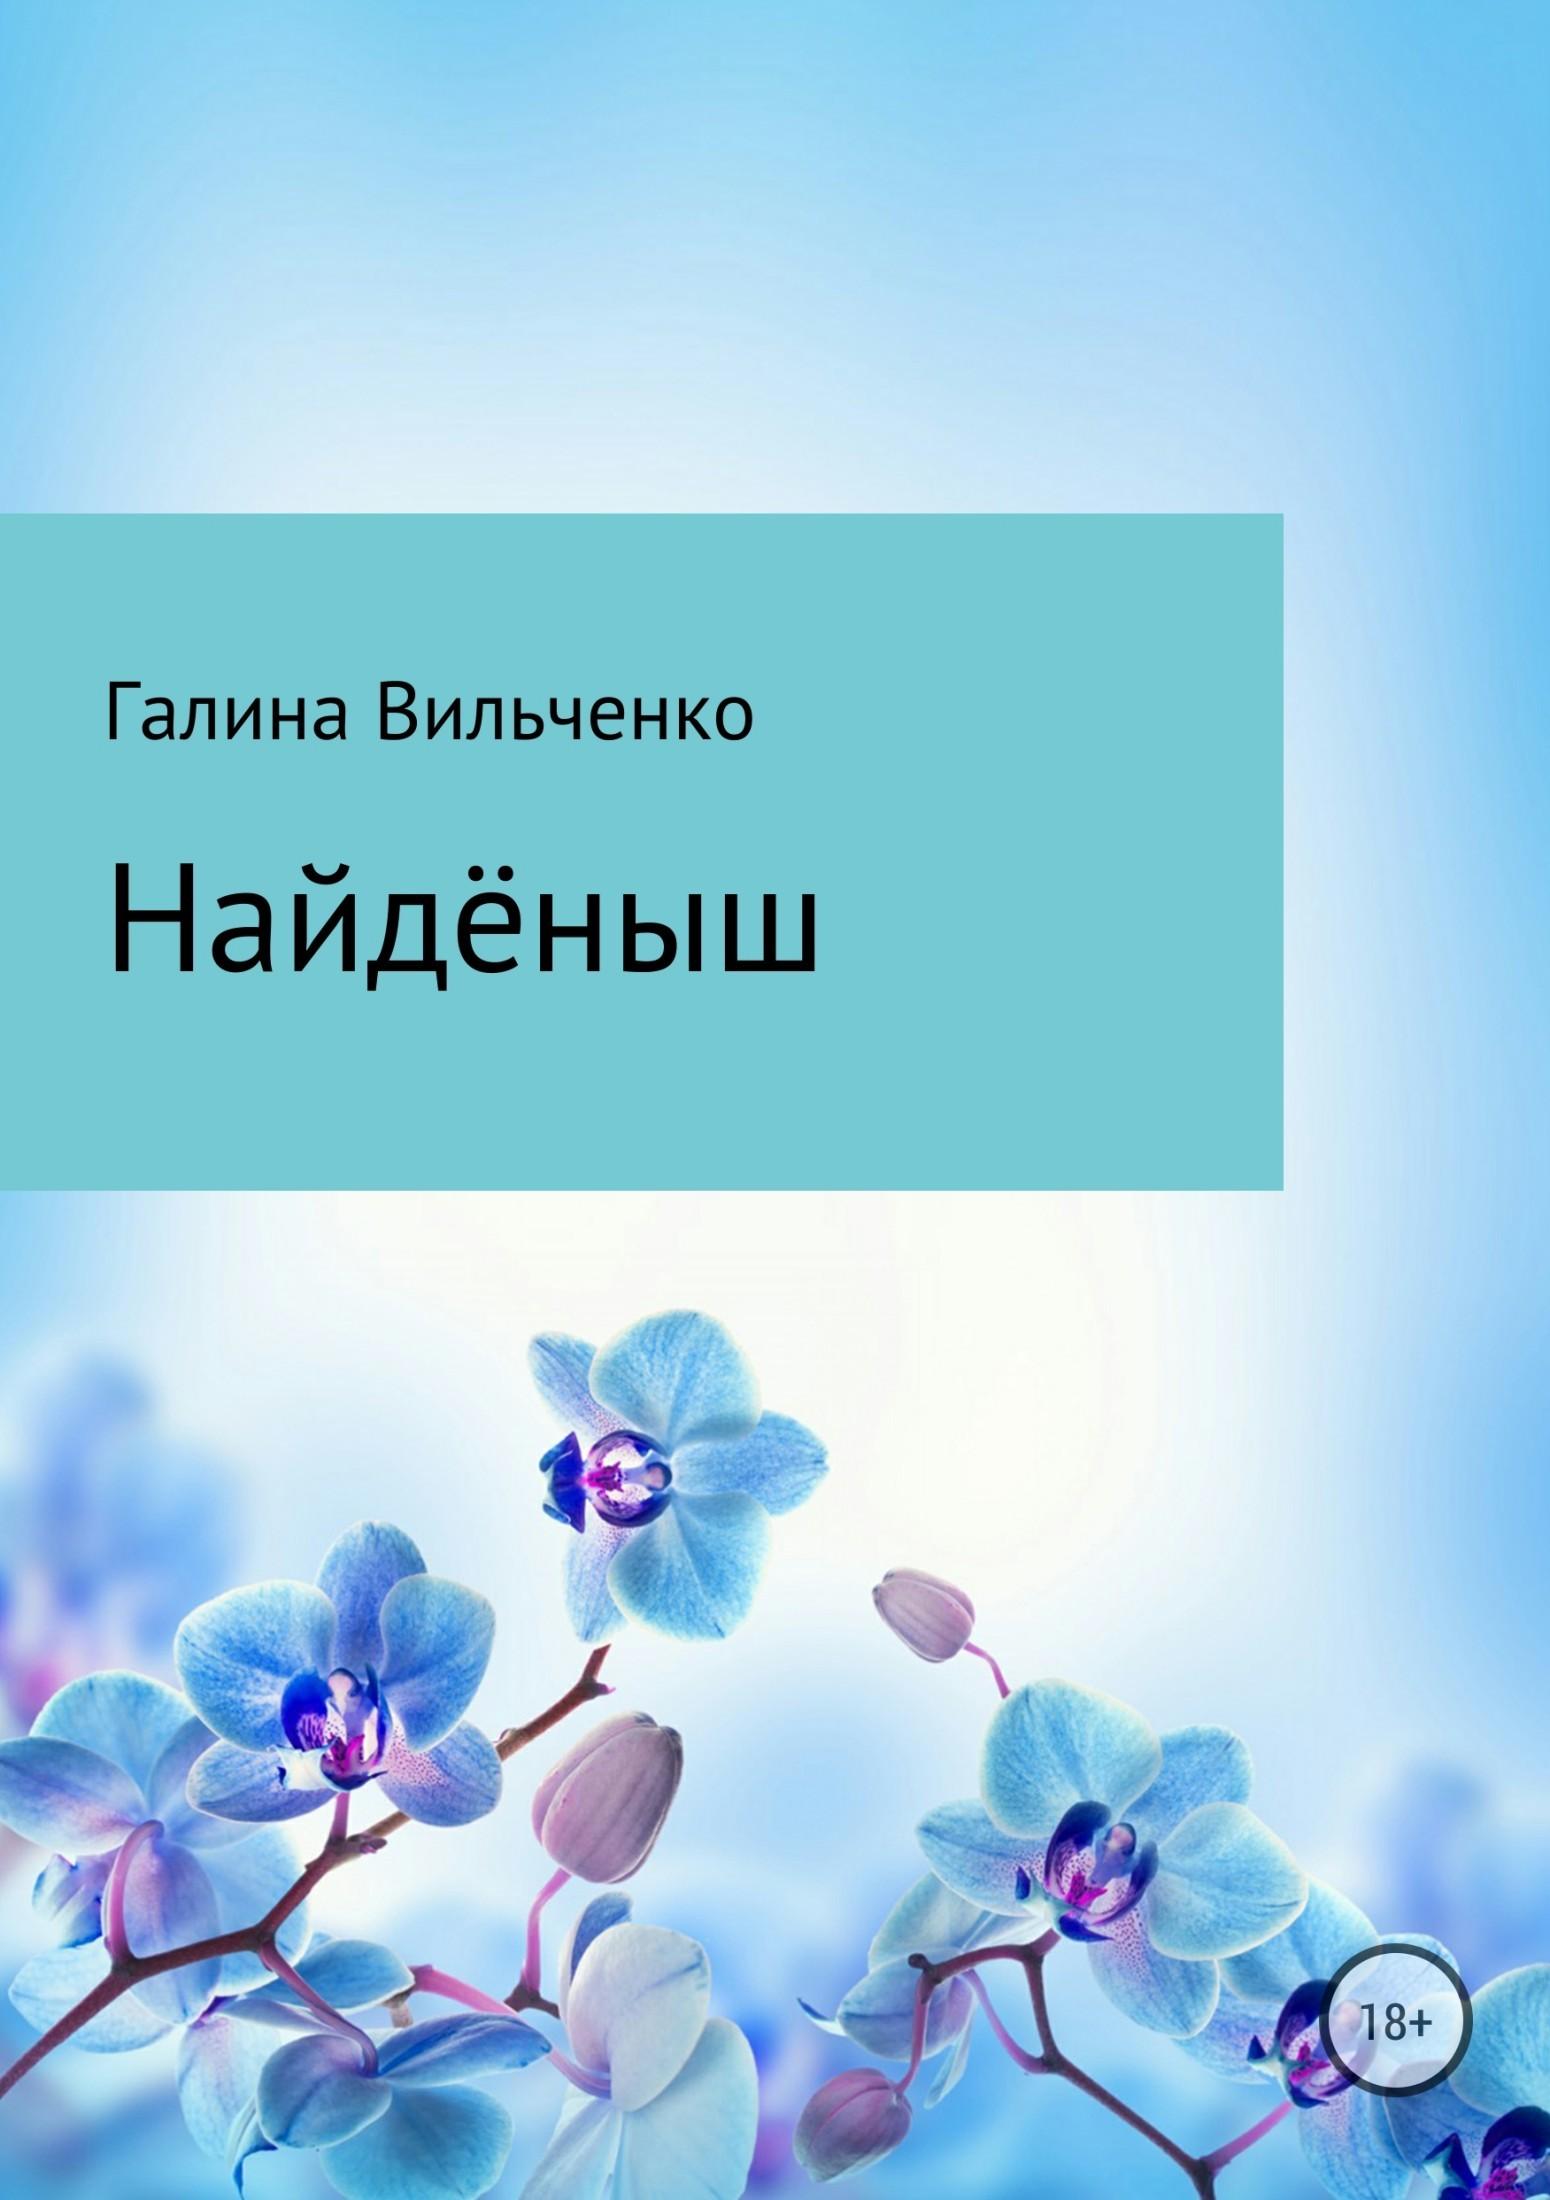 Галина Дмитриевна Вильченко. Найдёныш